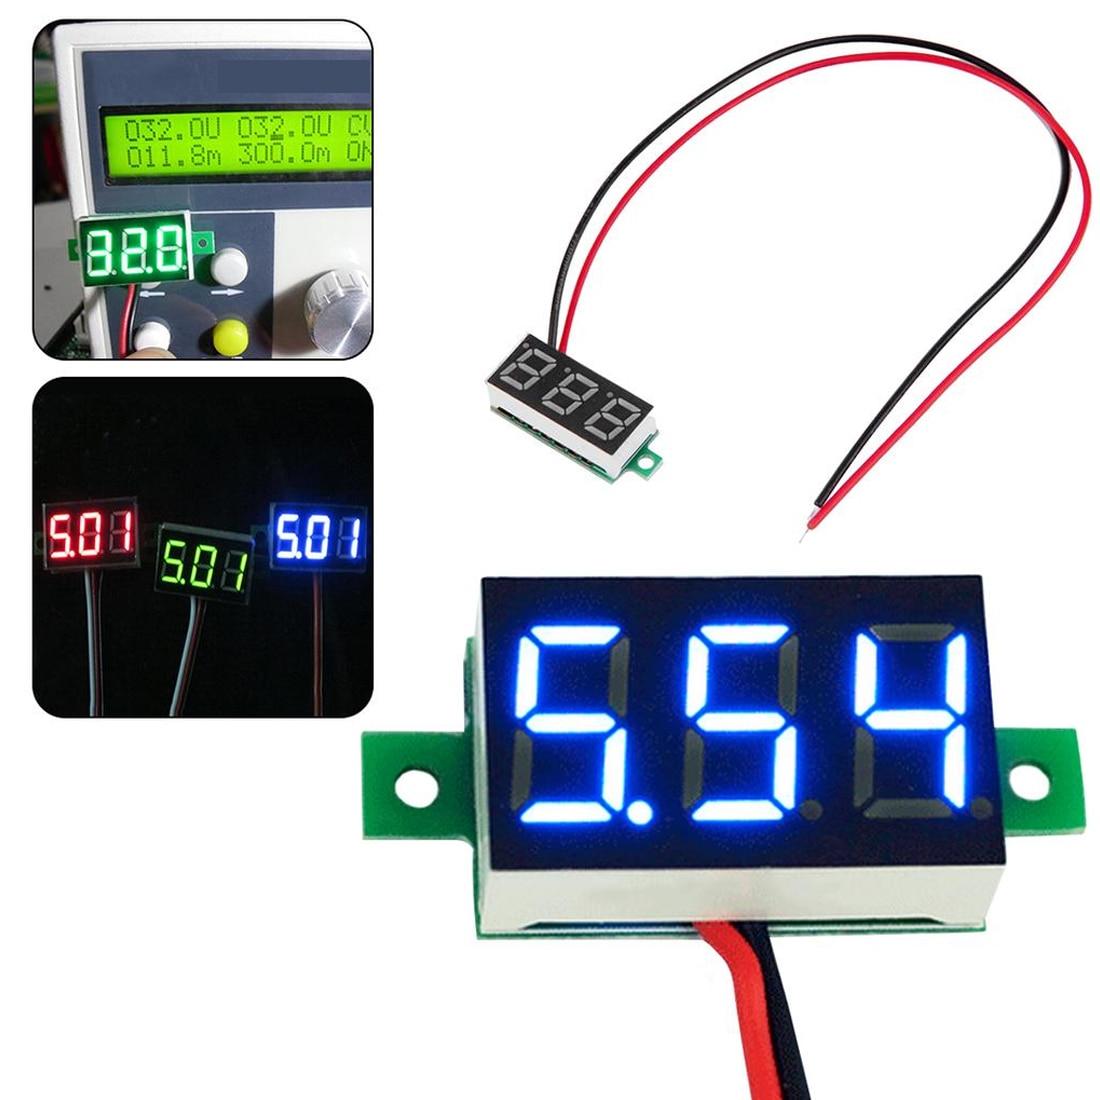 Tela led 0.28 Polegada 2.5v-30v mini digital voltímetro tensão tester medidor eletrônico peças acessórios voltímetro digital